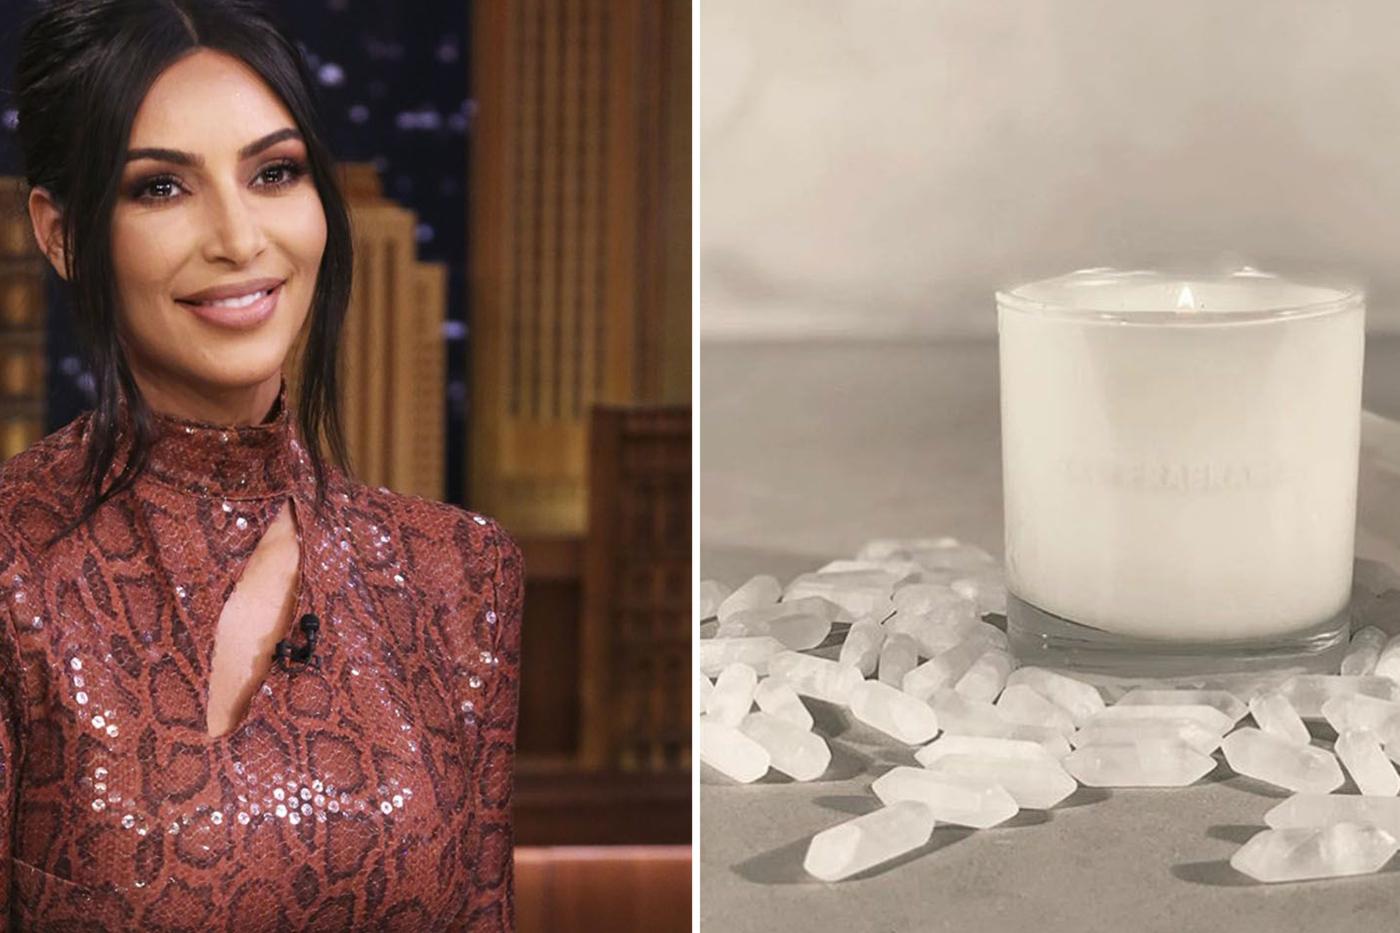 Kim Kardashian might launch new product